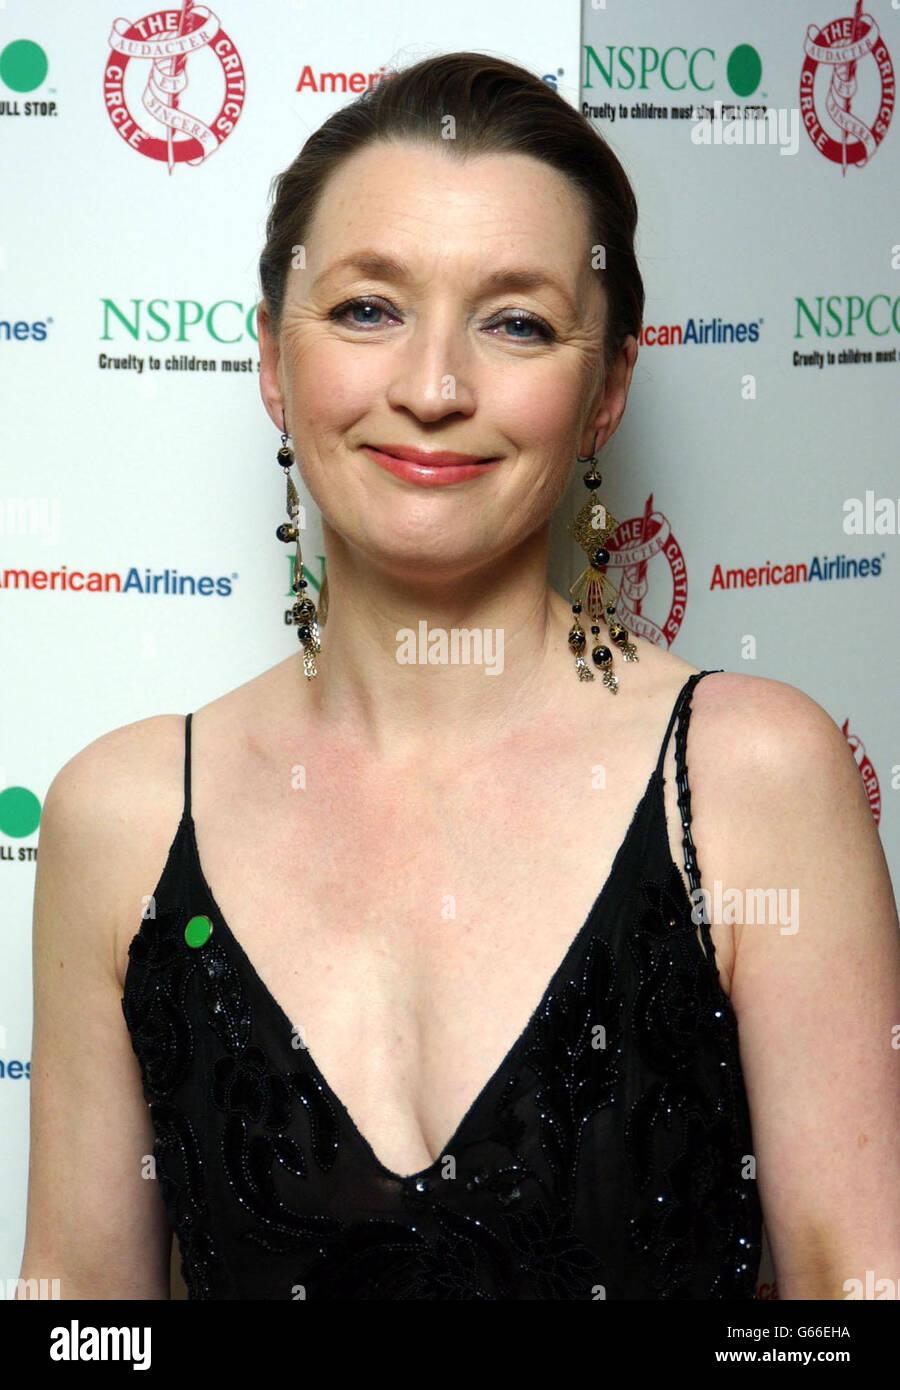 Manville Film Critic Awards Stock Photo